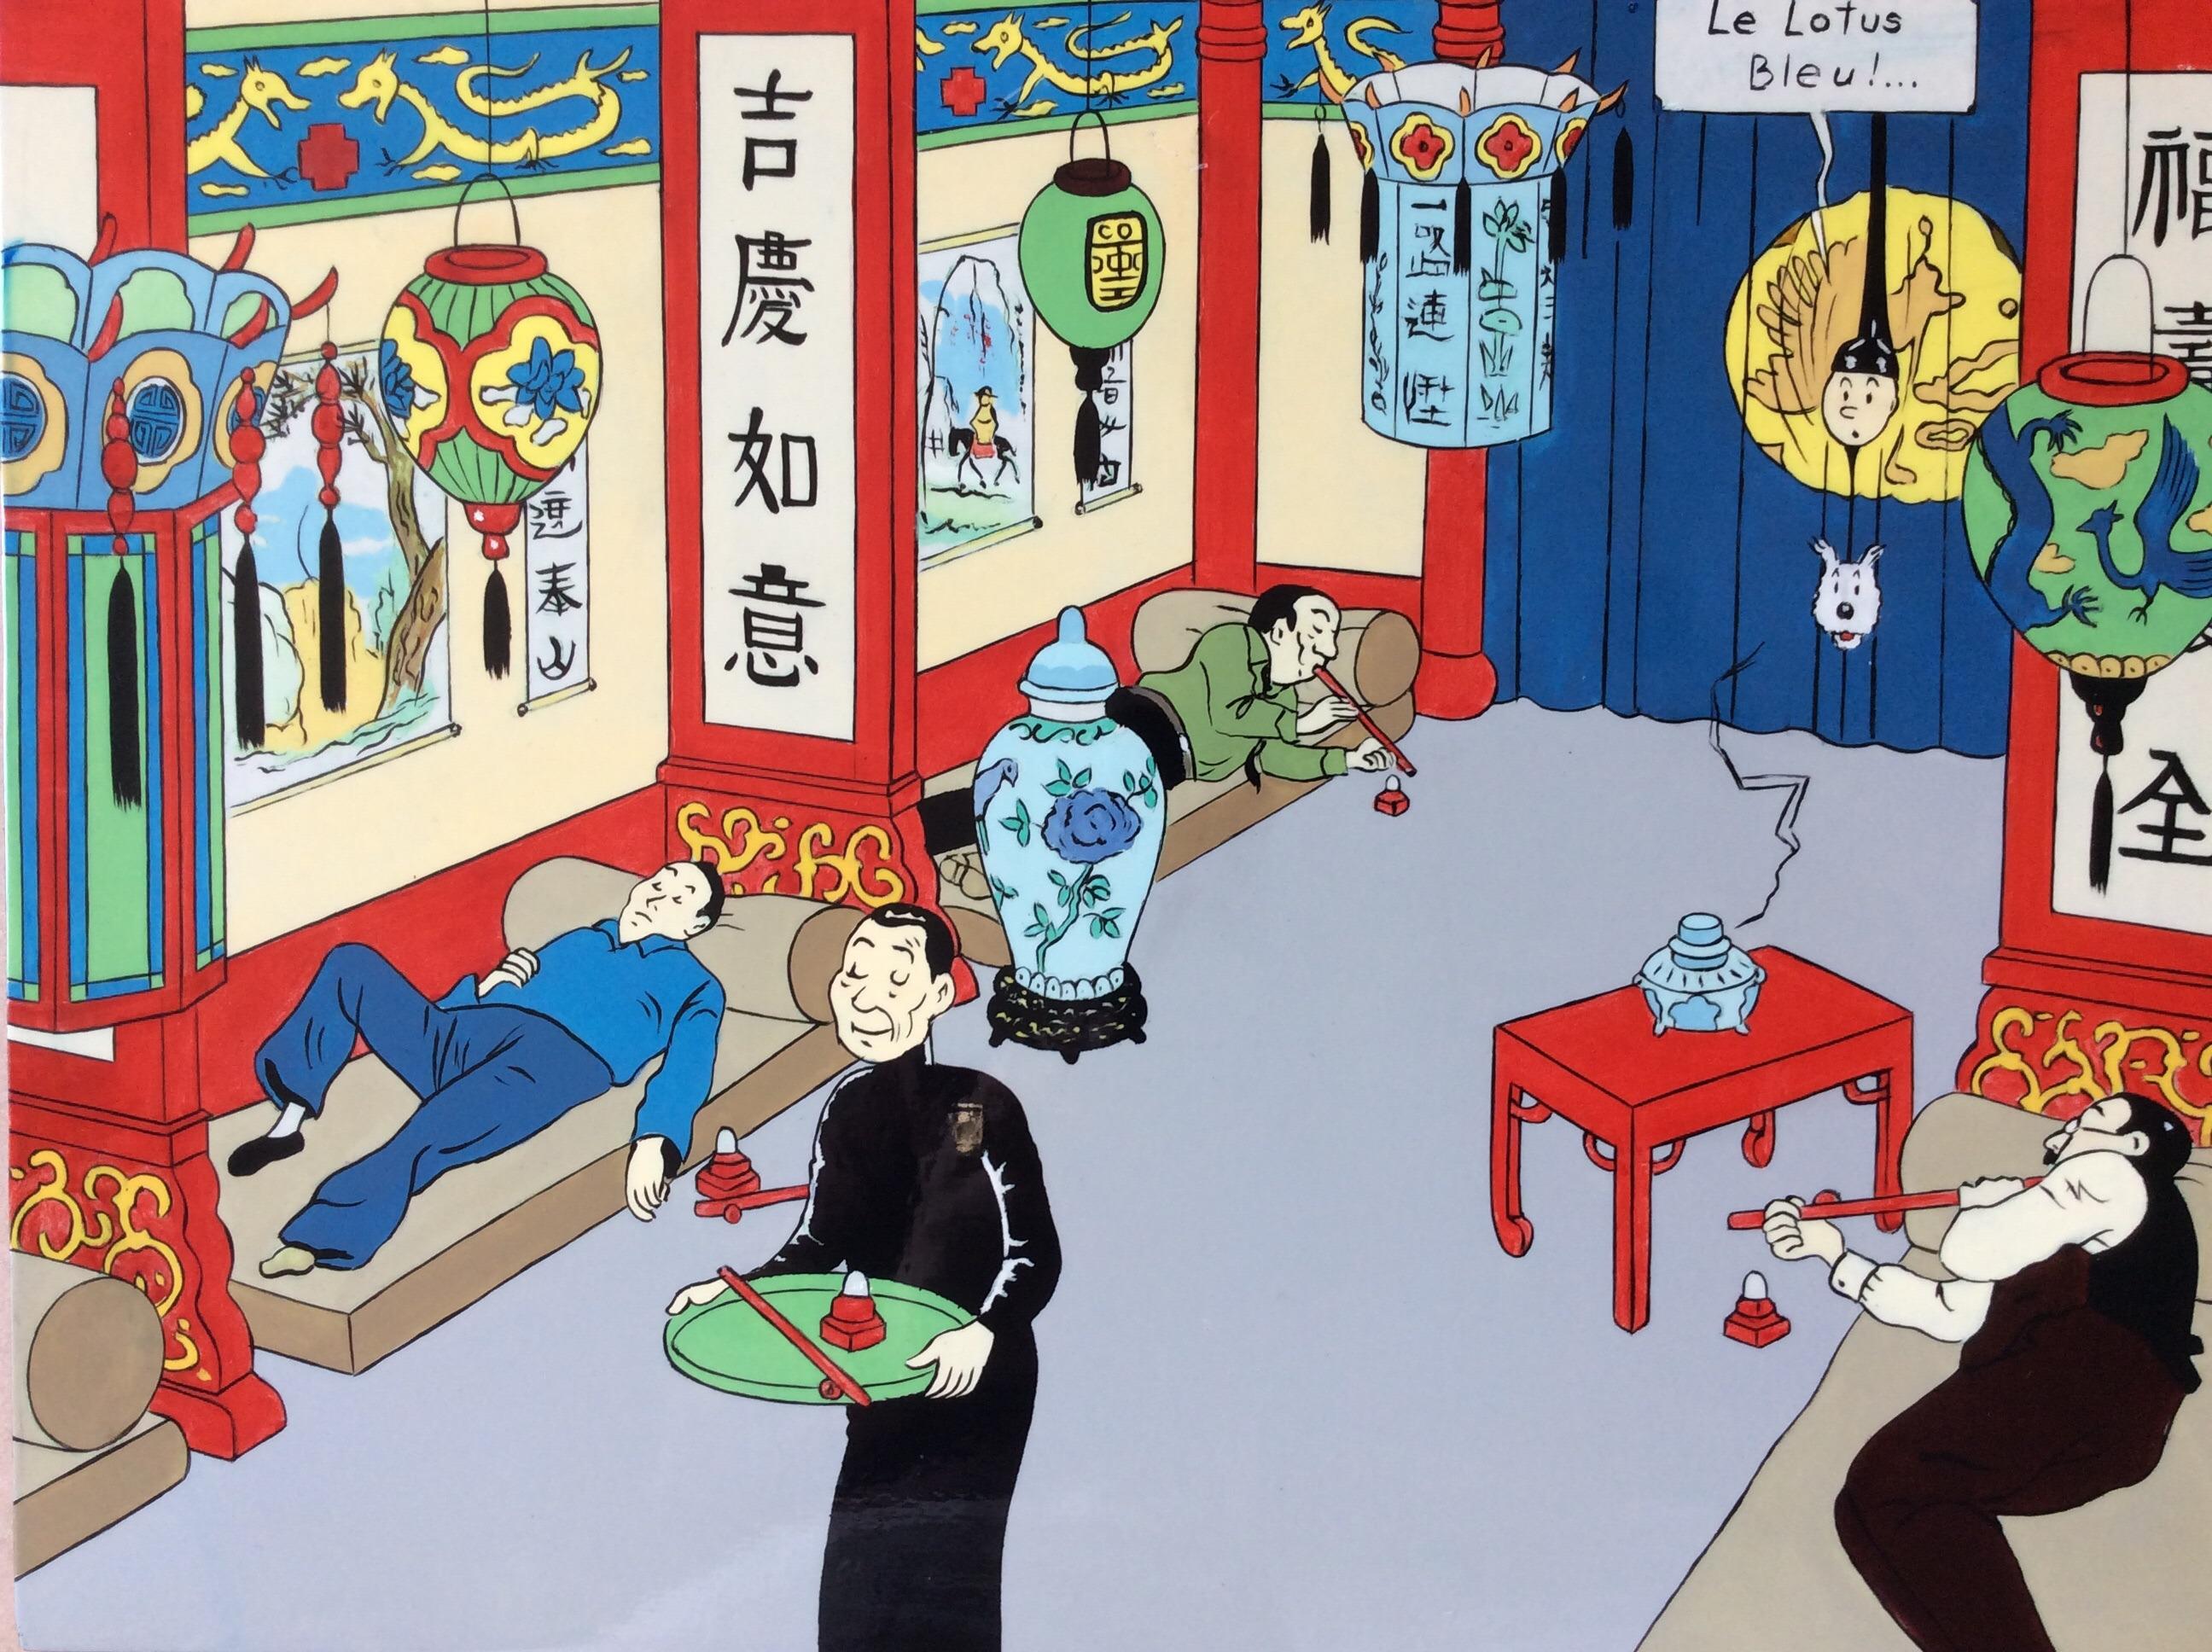 Tintin - Lotus Bleu par Hergé - Illustration